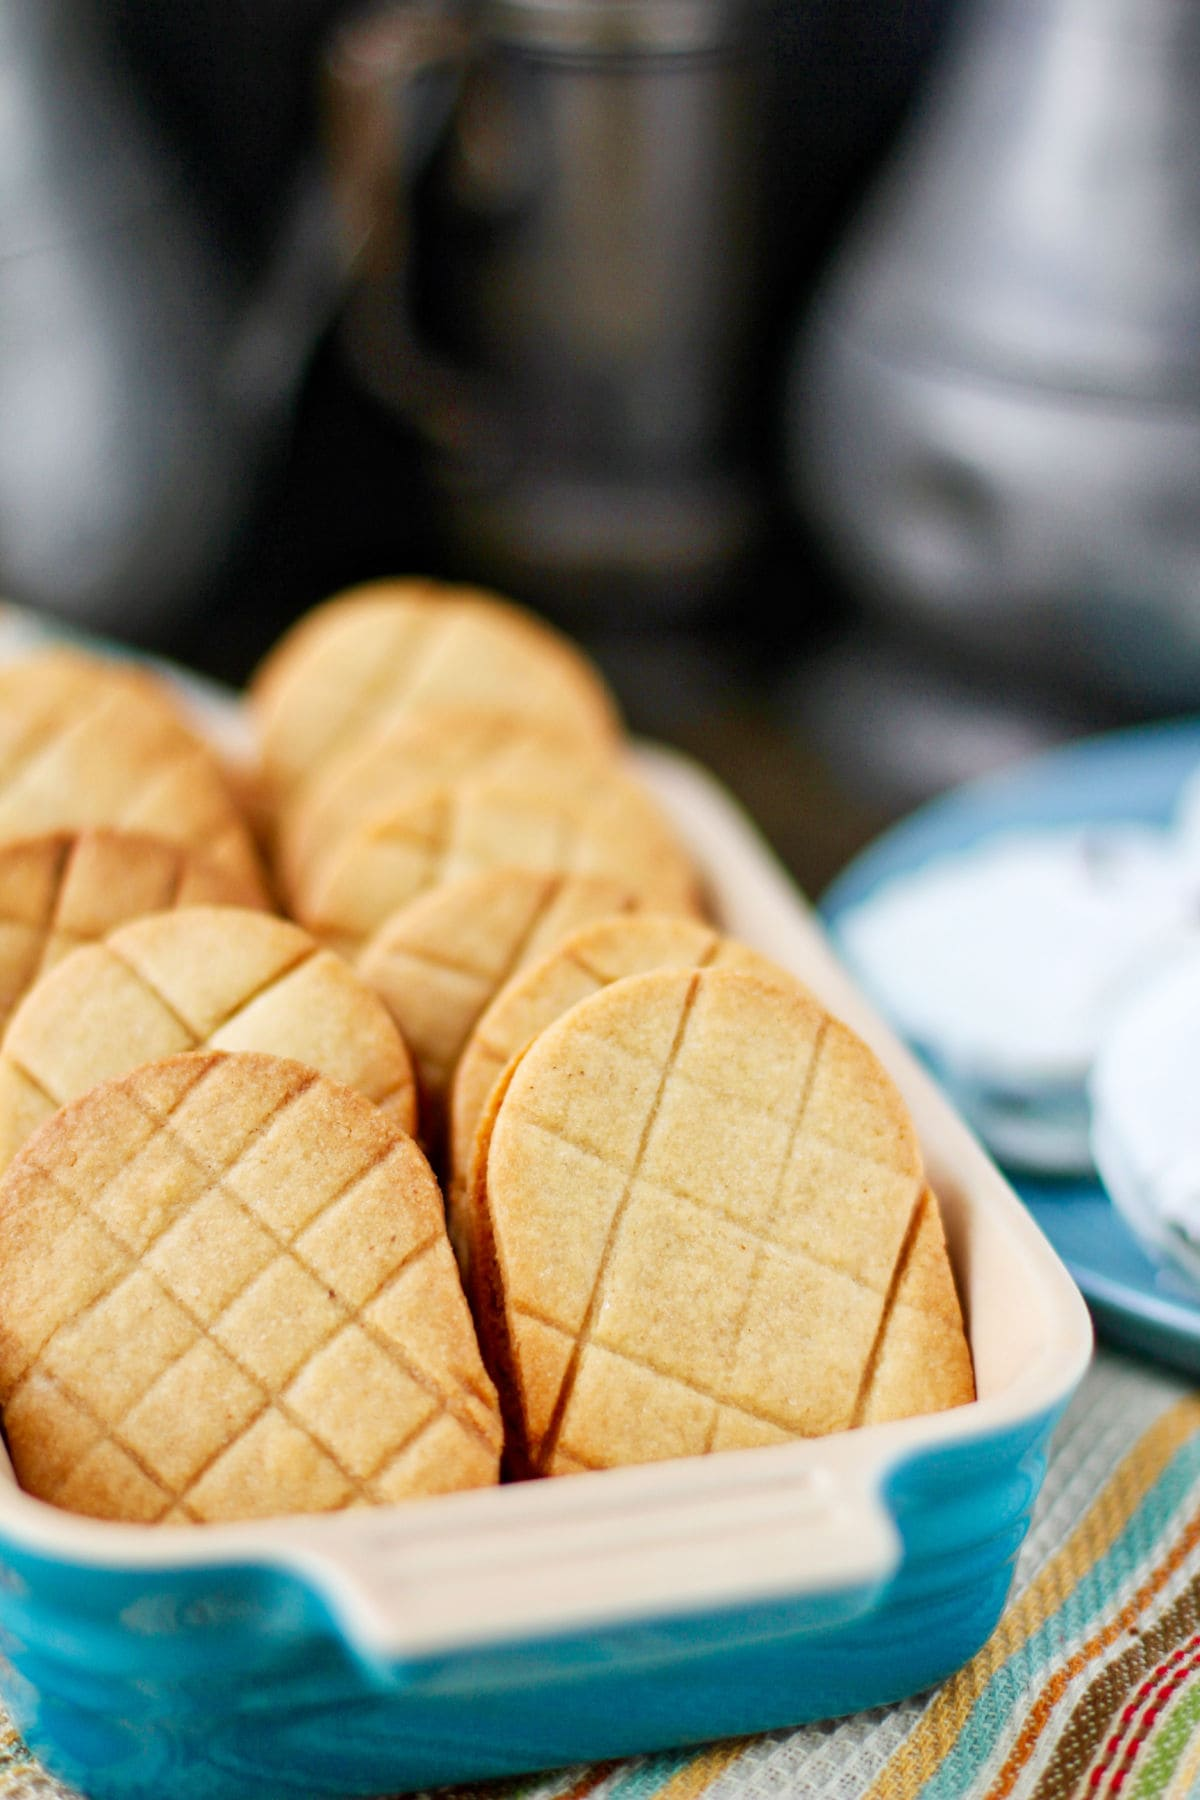 Nutter Butter cookies in a casserole.